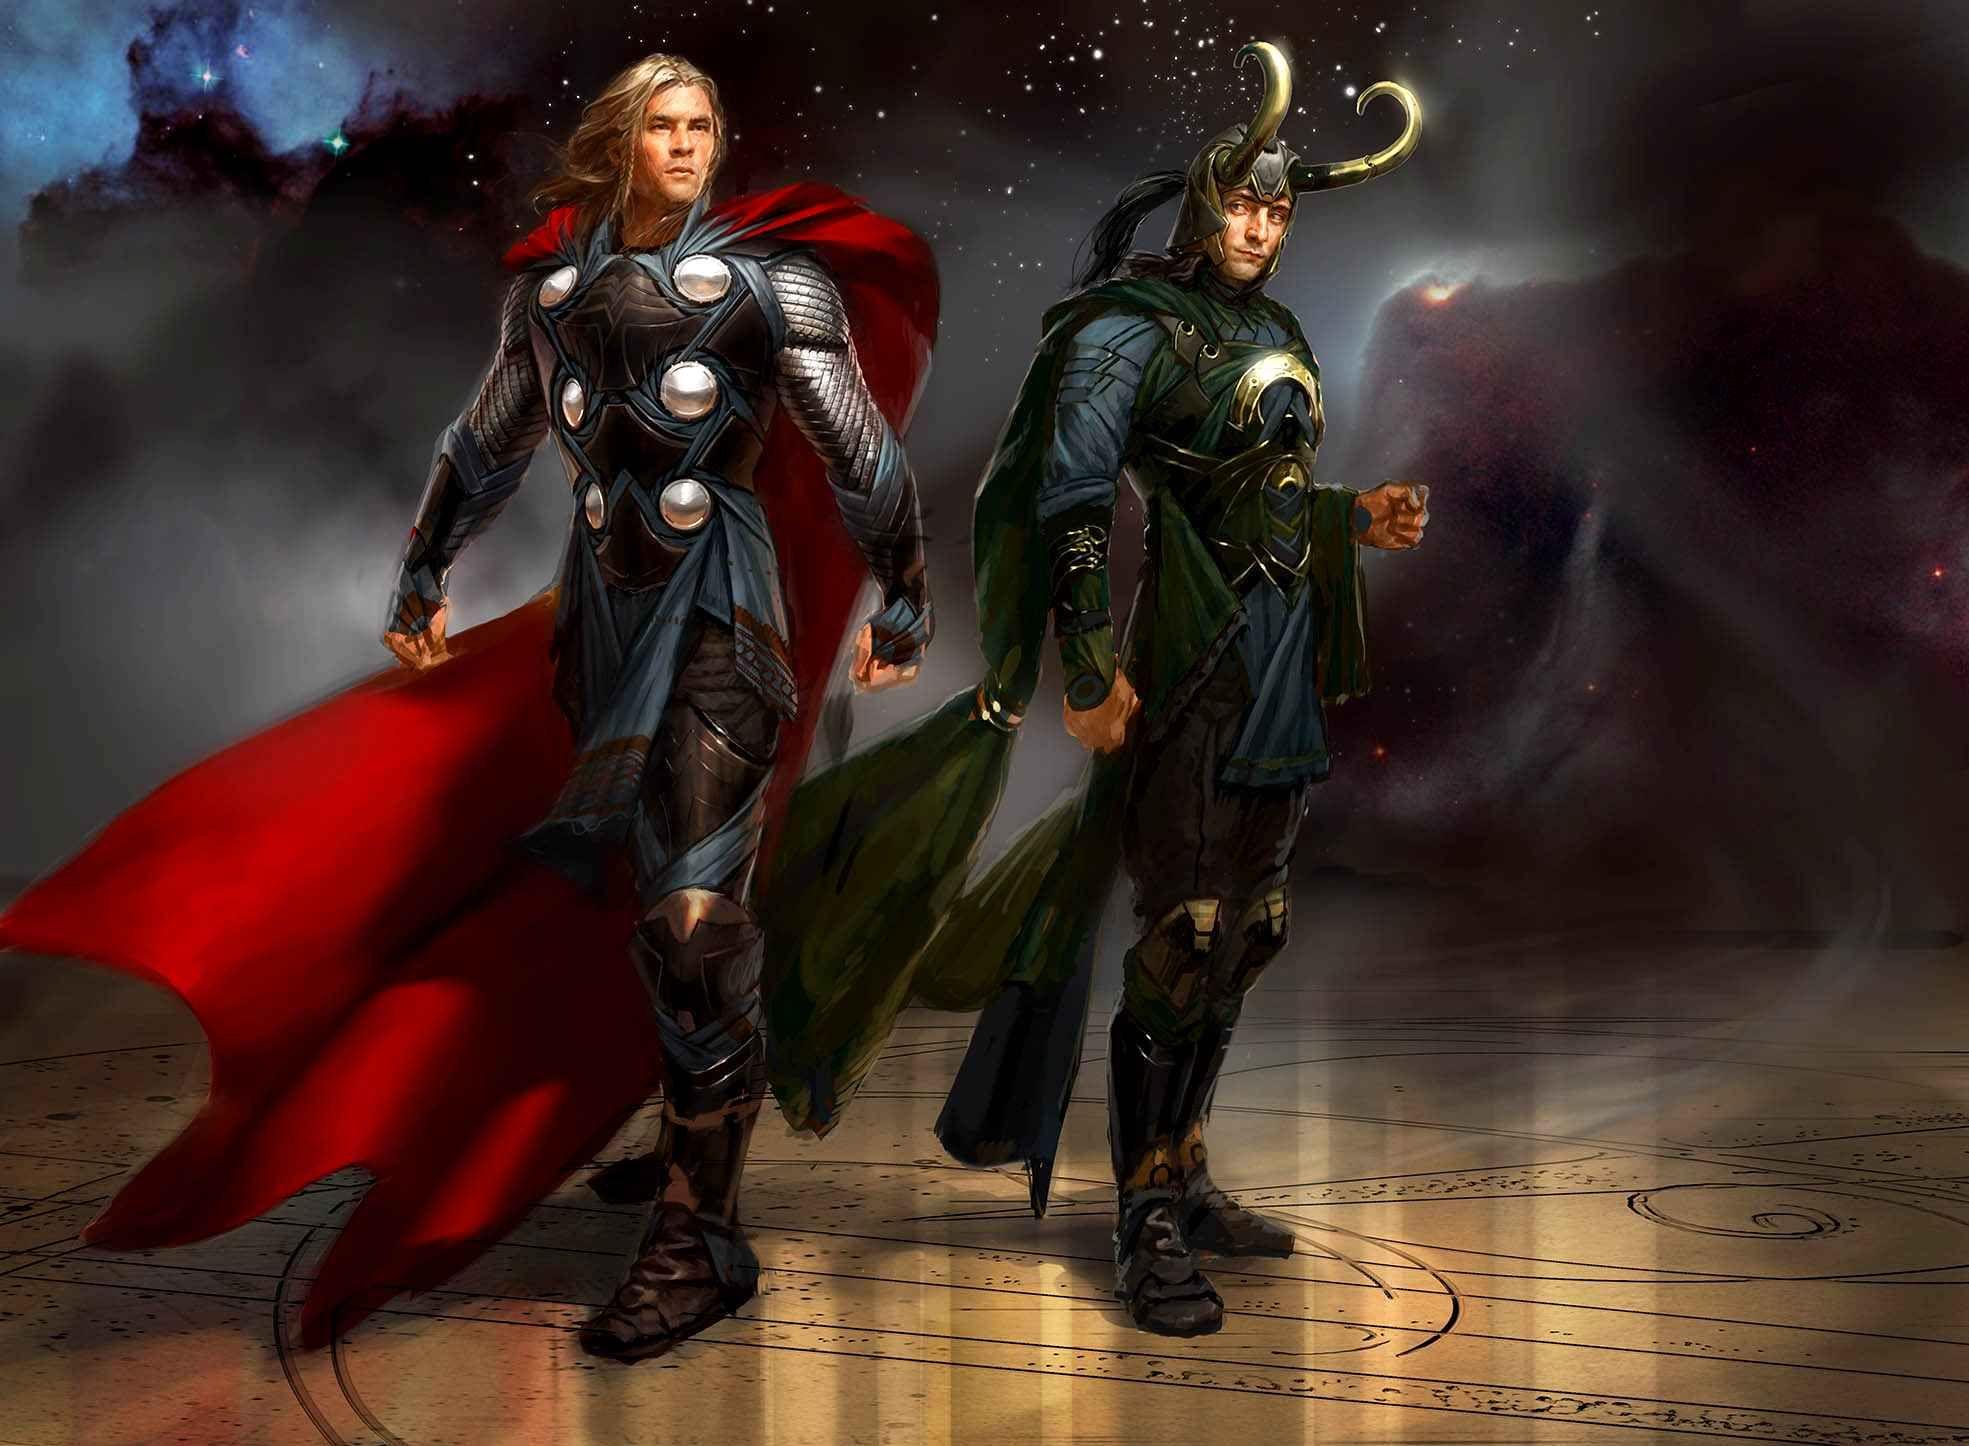 Loki Concept Art http://rodneyf.blogspot.co.uk/2012/06/marvels ...